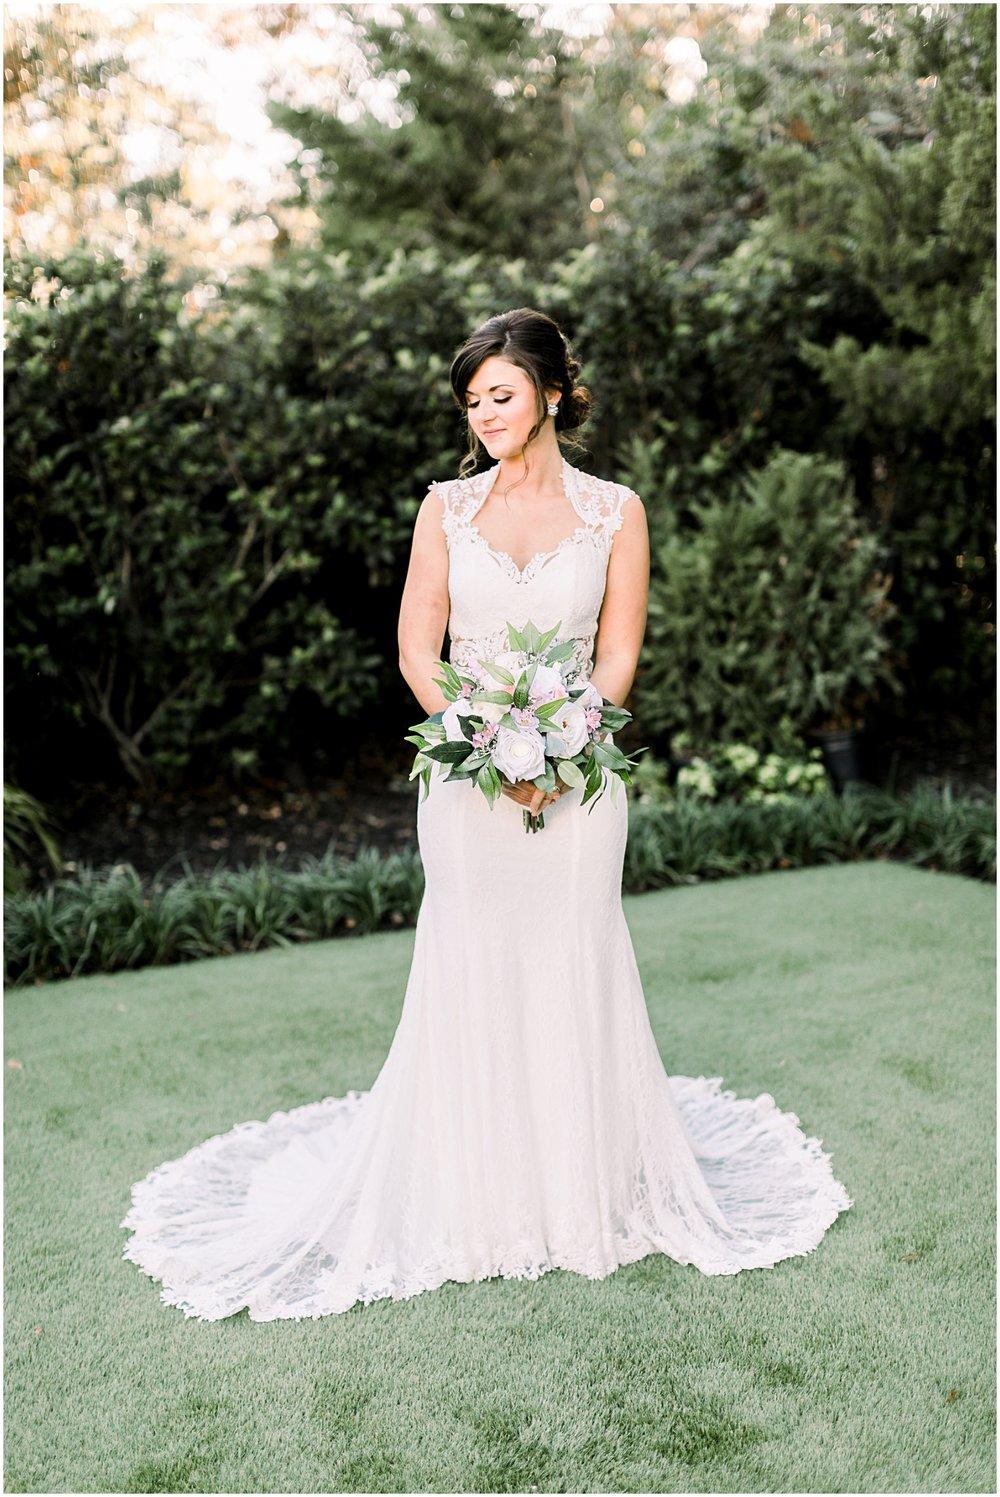 Wrightsville Manor Wedding Venue, Downtown Wilmington NC Wedding_Erin L. Taylor Photography_0023.jpg